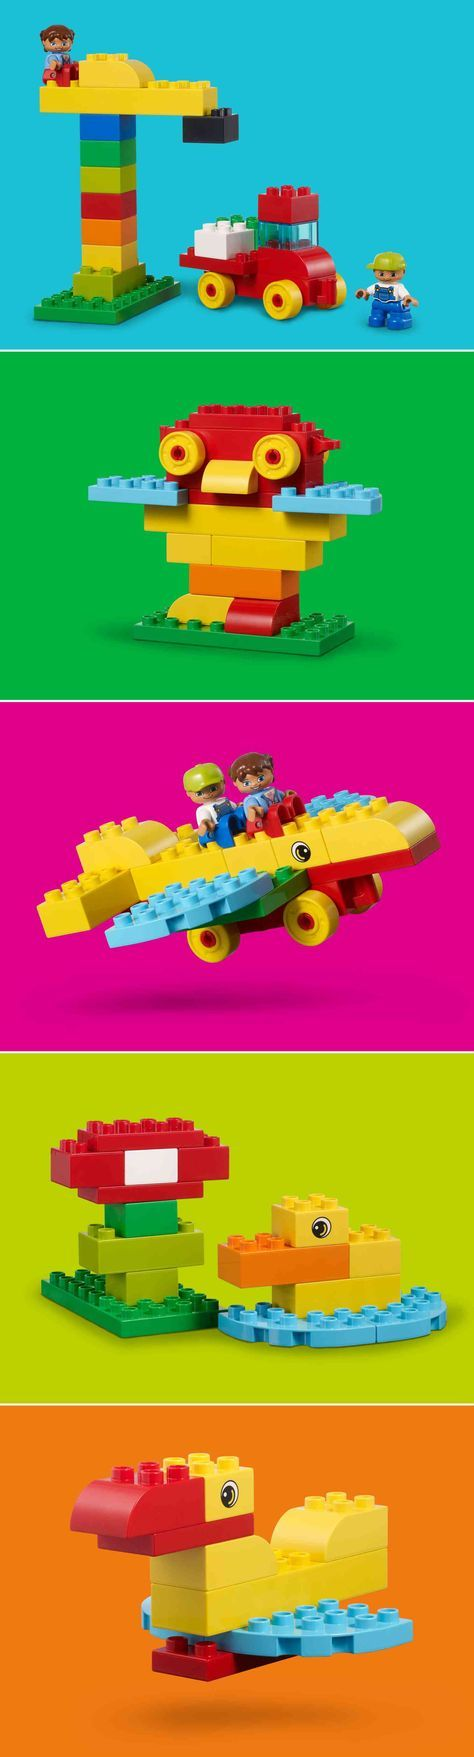 Easy builds with LEGO® DUPLO® - Artikel - Family LEGO.com